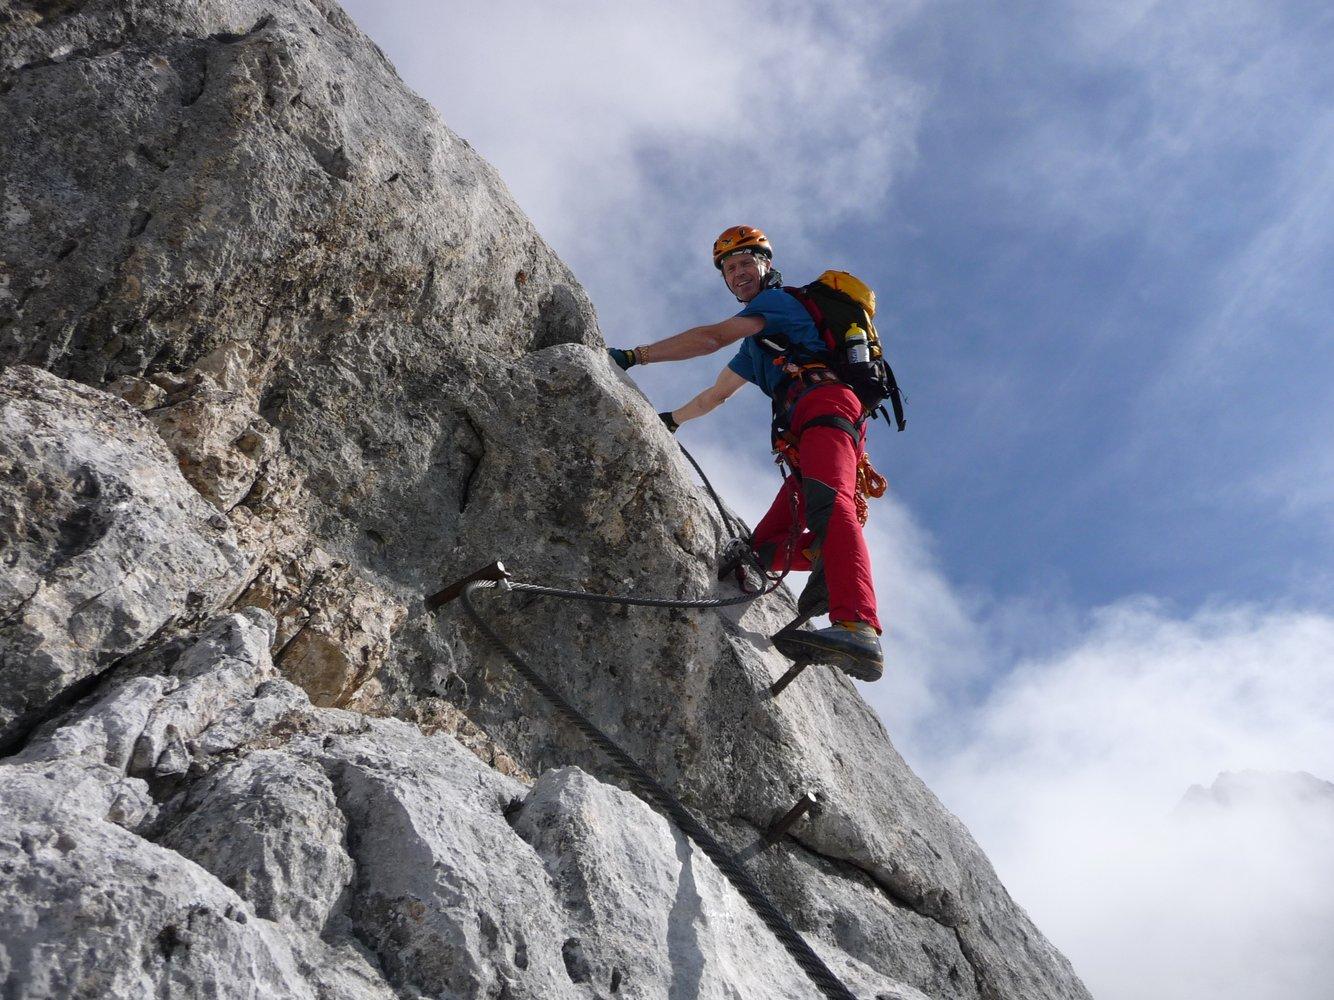 Klettersteig Johann Topo : Der johann klettersteig südwandklettersteig bergsteigen.com